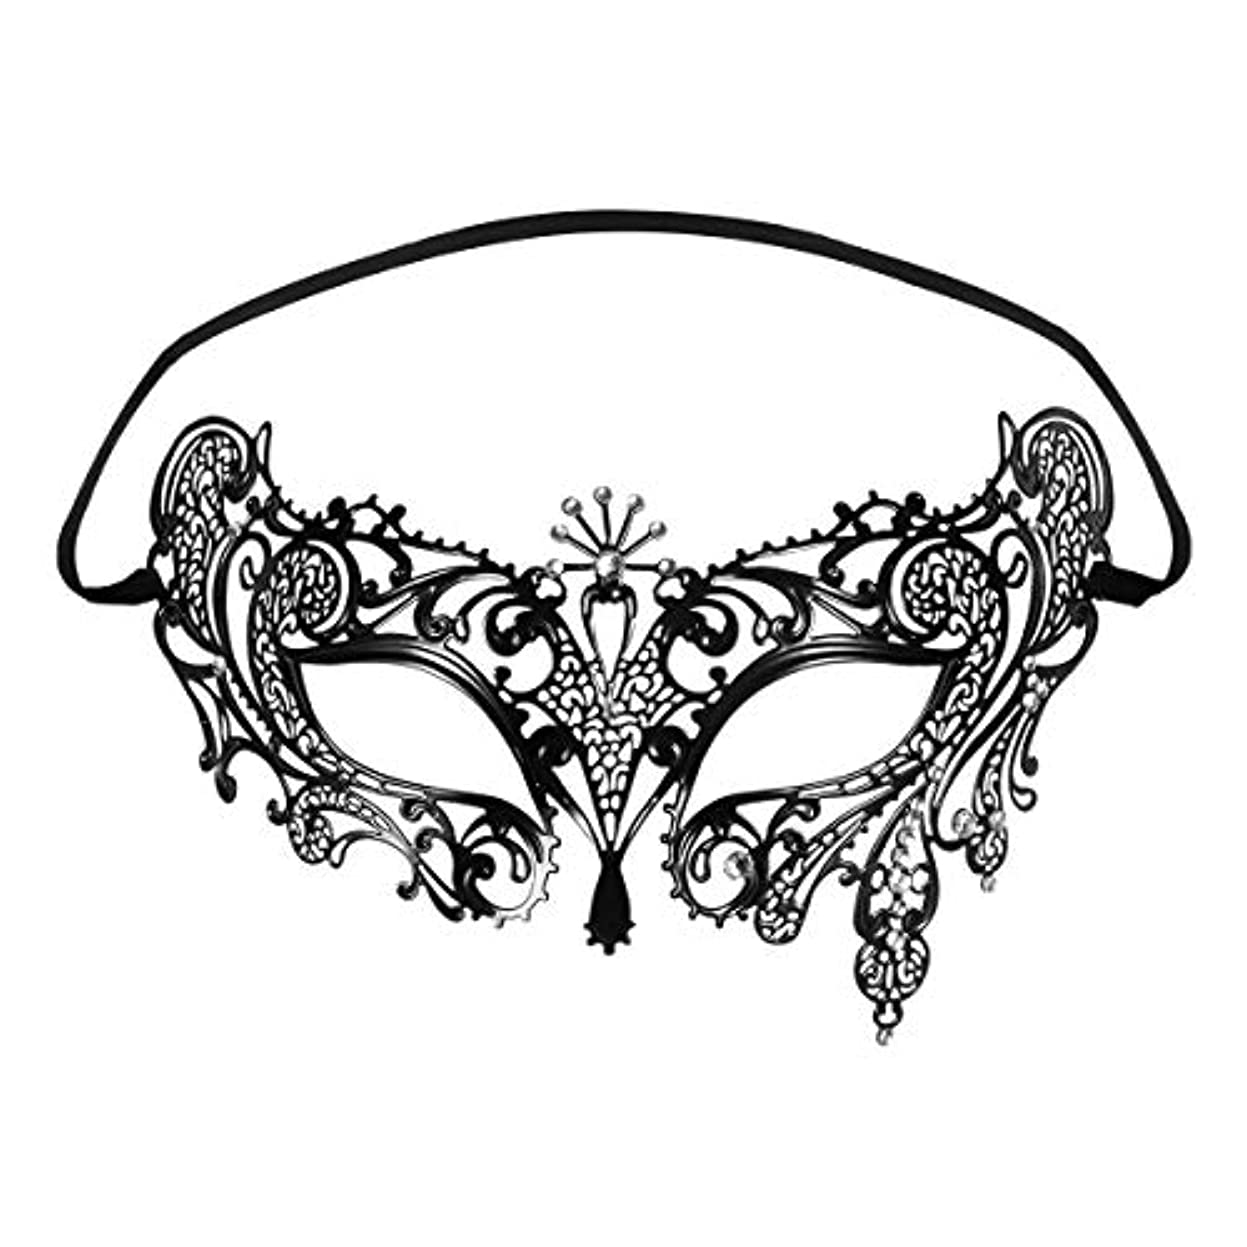 Foxnovo Foxnovoファッション高級ベネチアンスタイルディアマンテメタルフィリグリー仮装用マスク結婚式/パーティー用(ブラック)